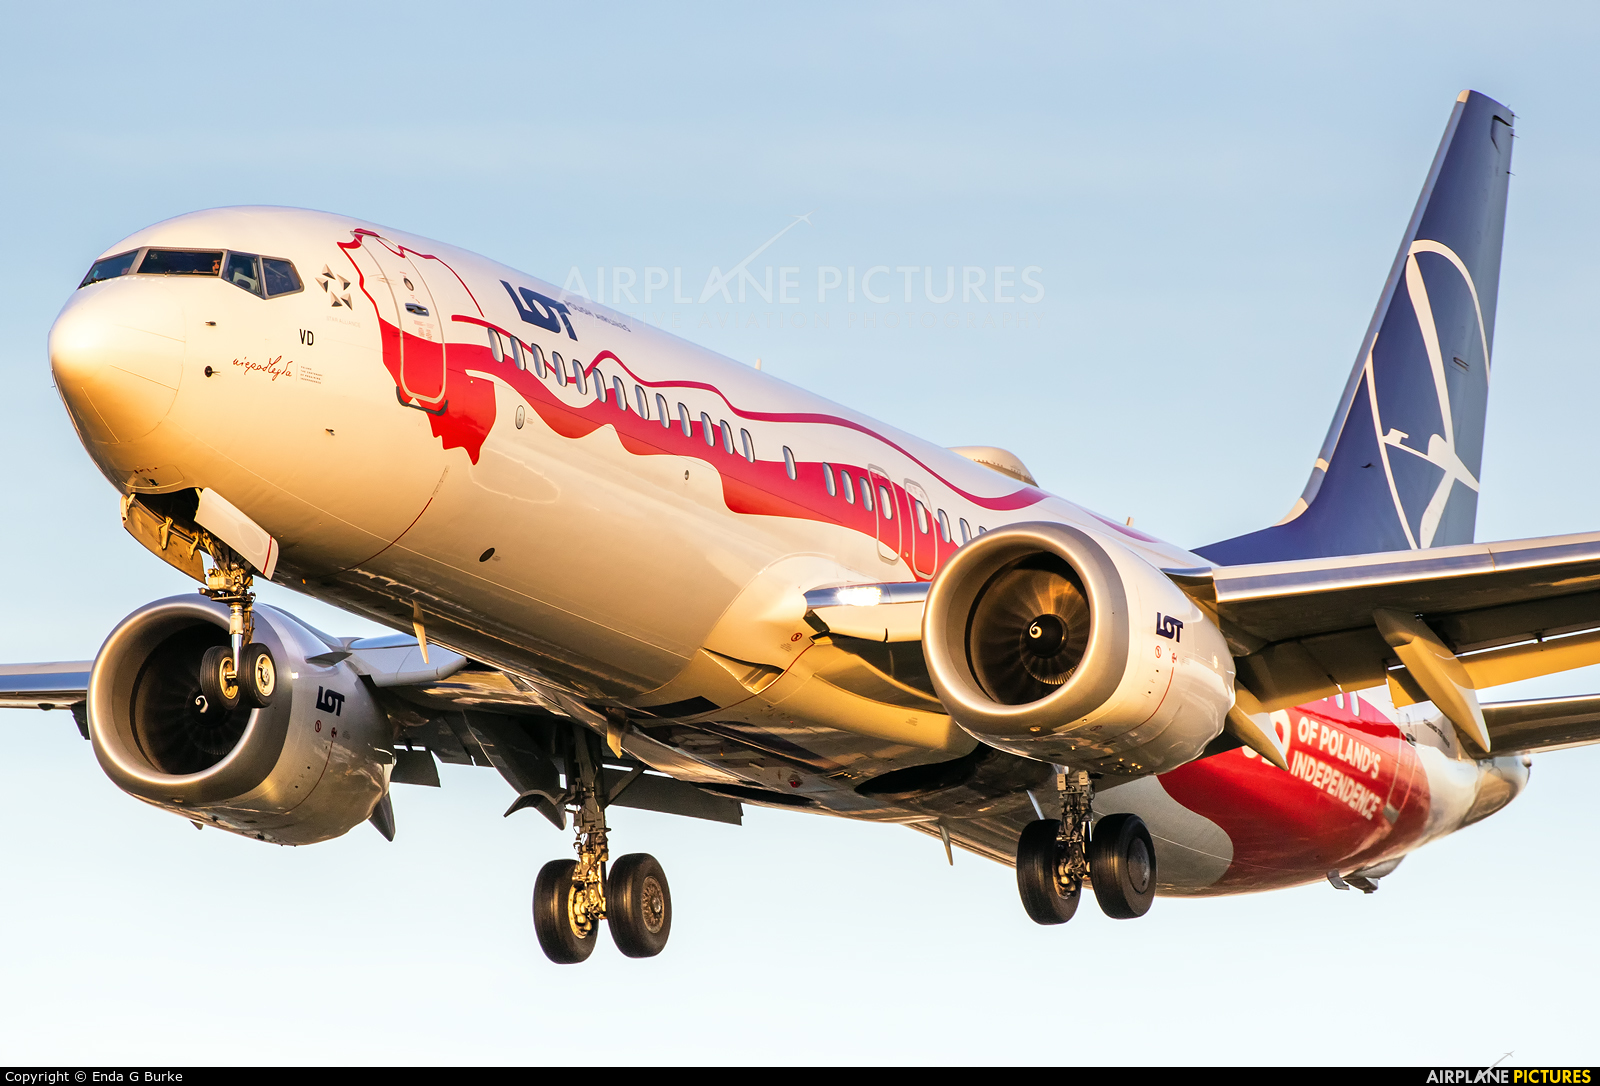 LOT - Polish Airlines SP-LVD aircraft at London - Heathrow